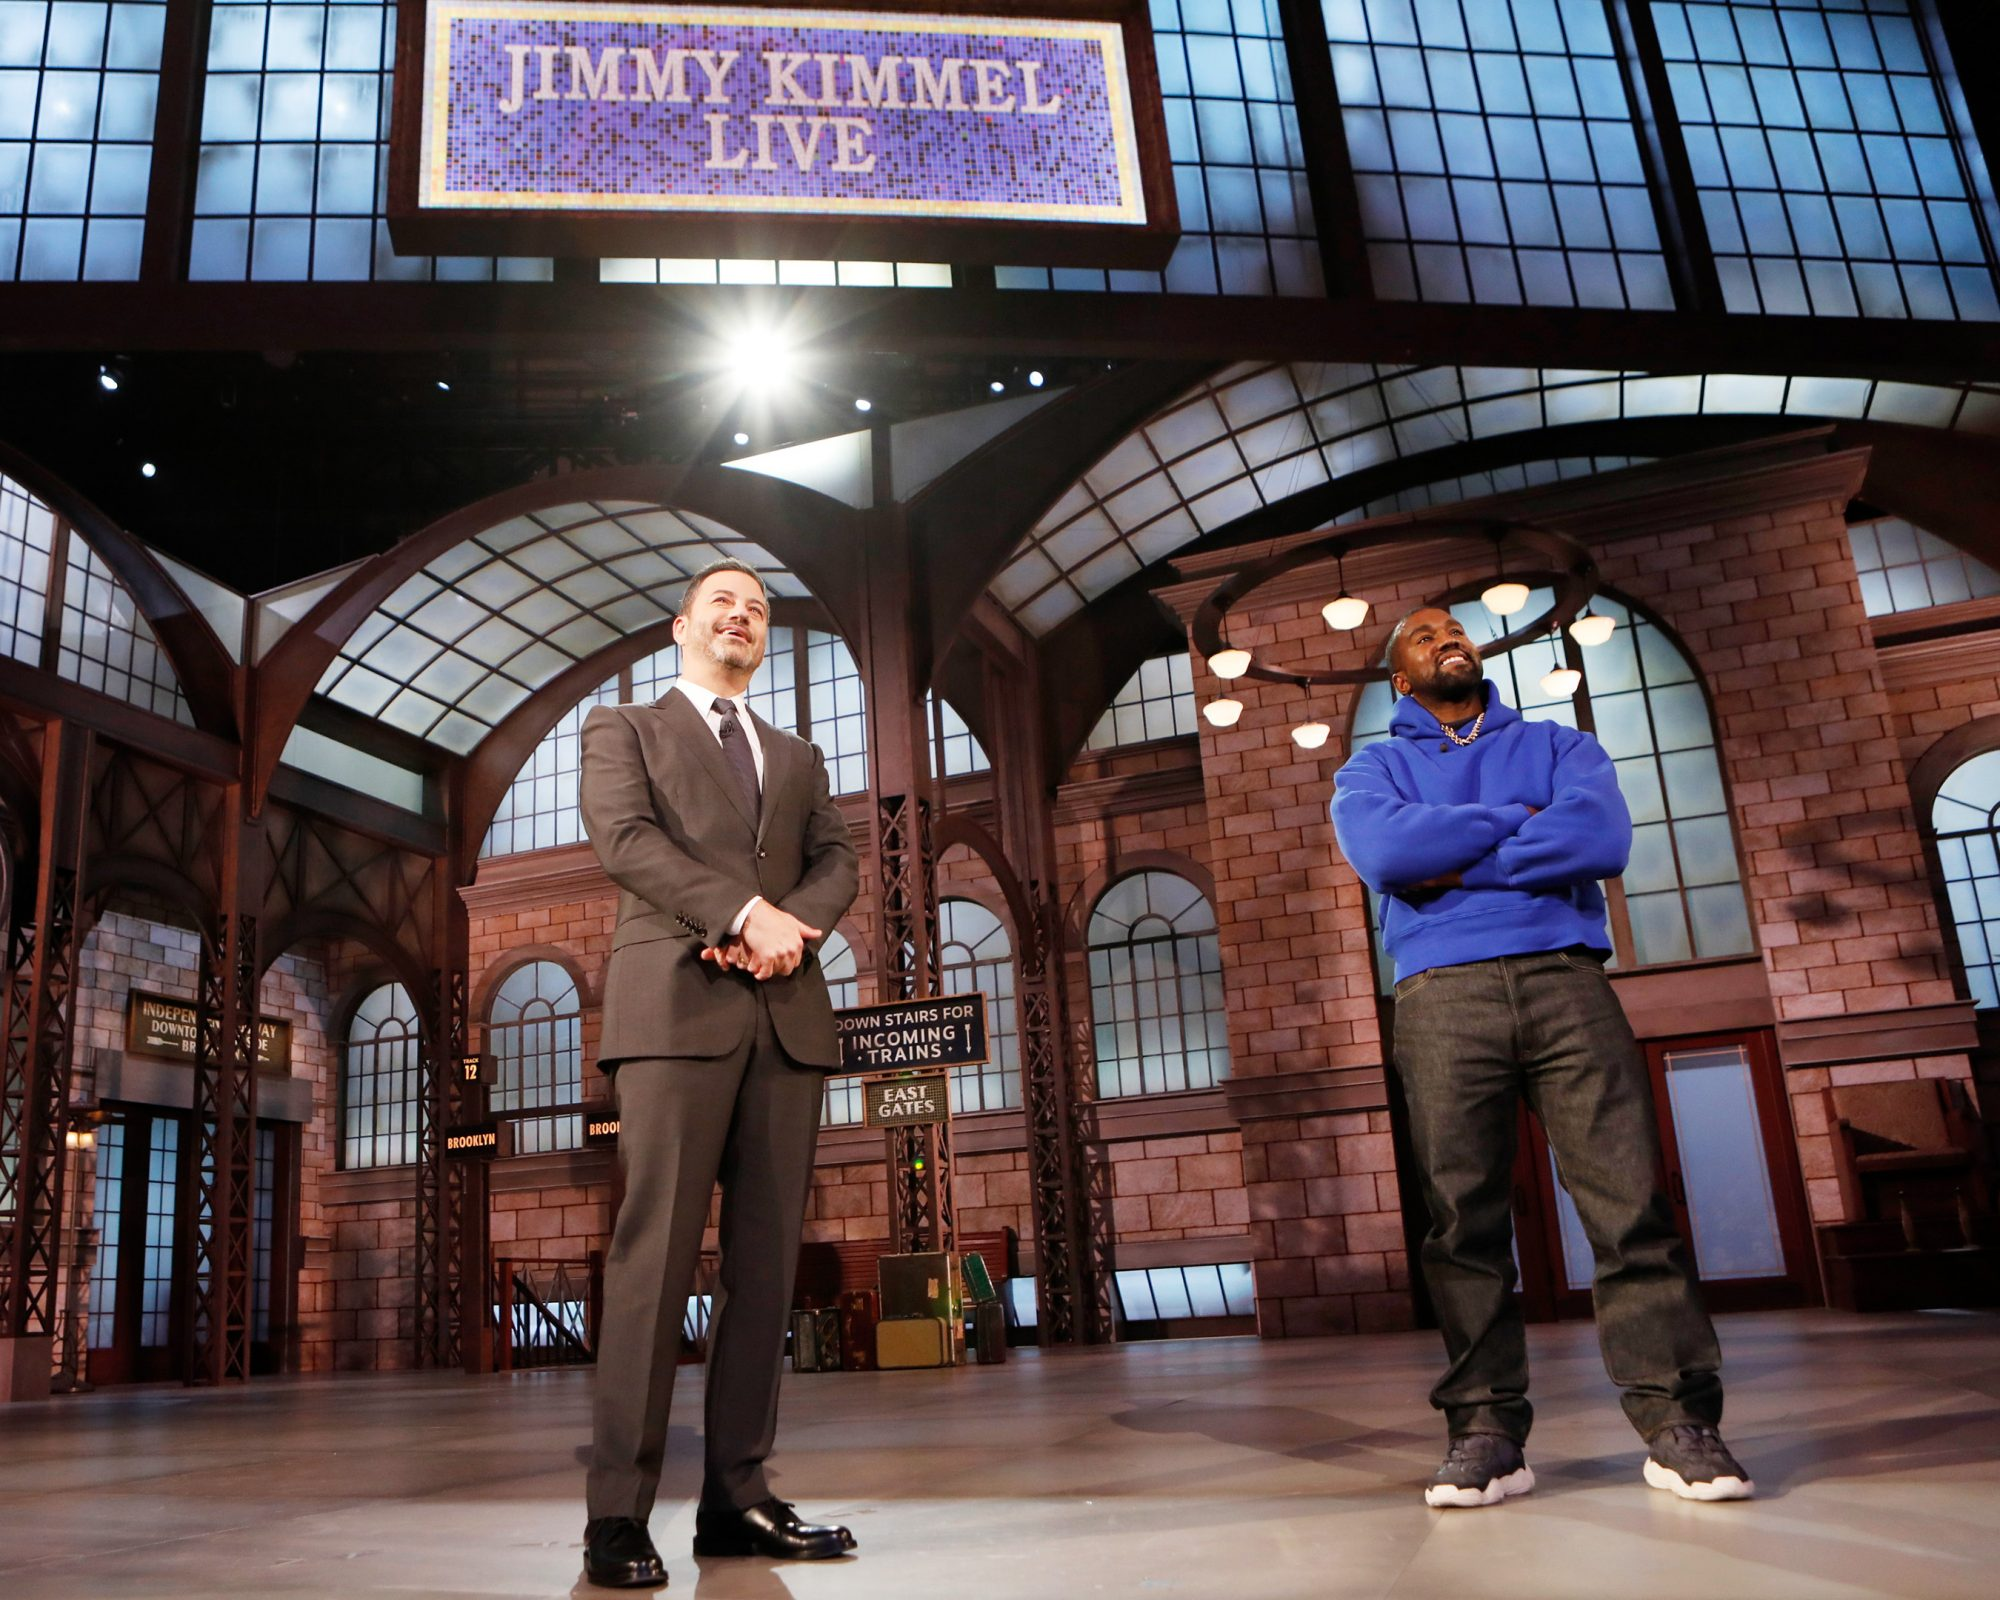 Jimmy Kimmel Live Kanye West